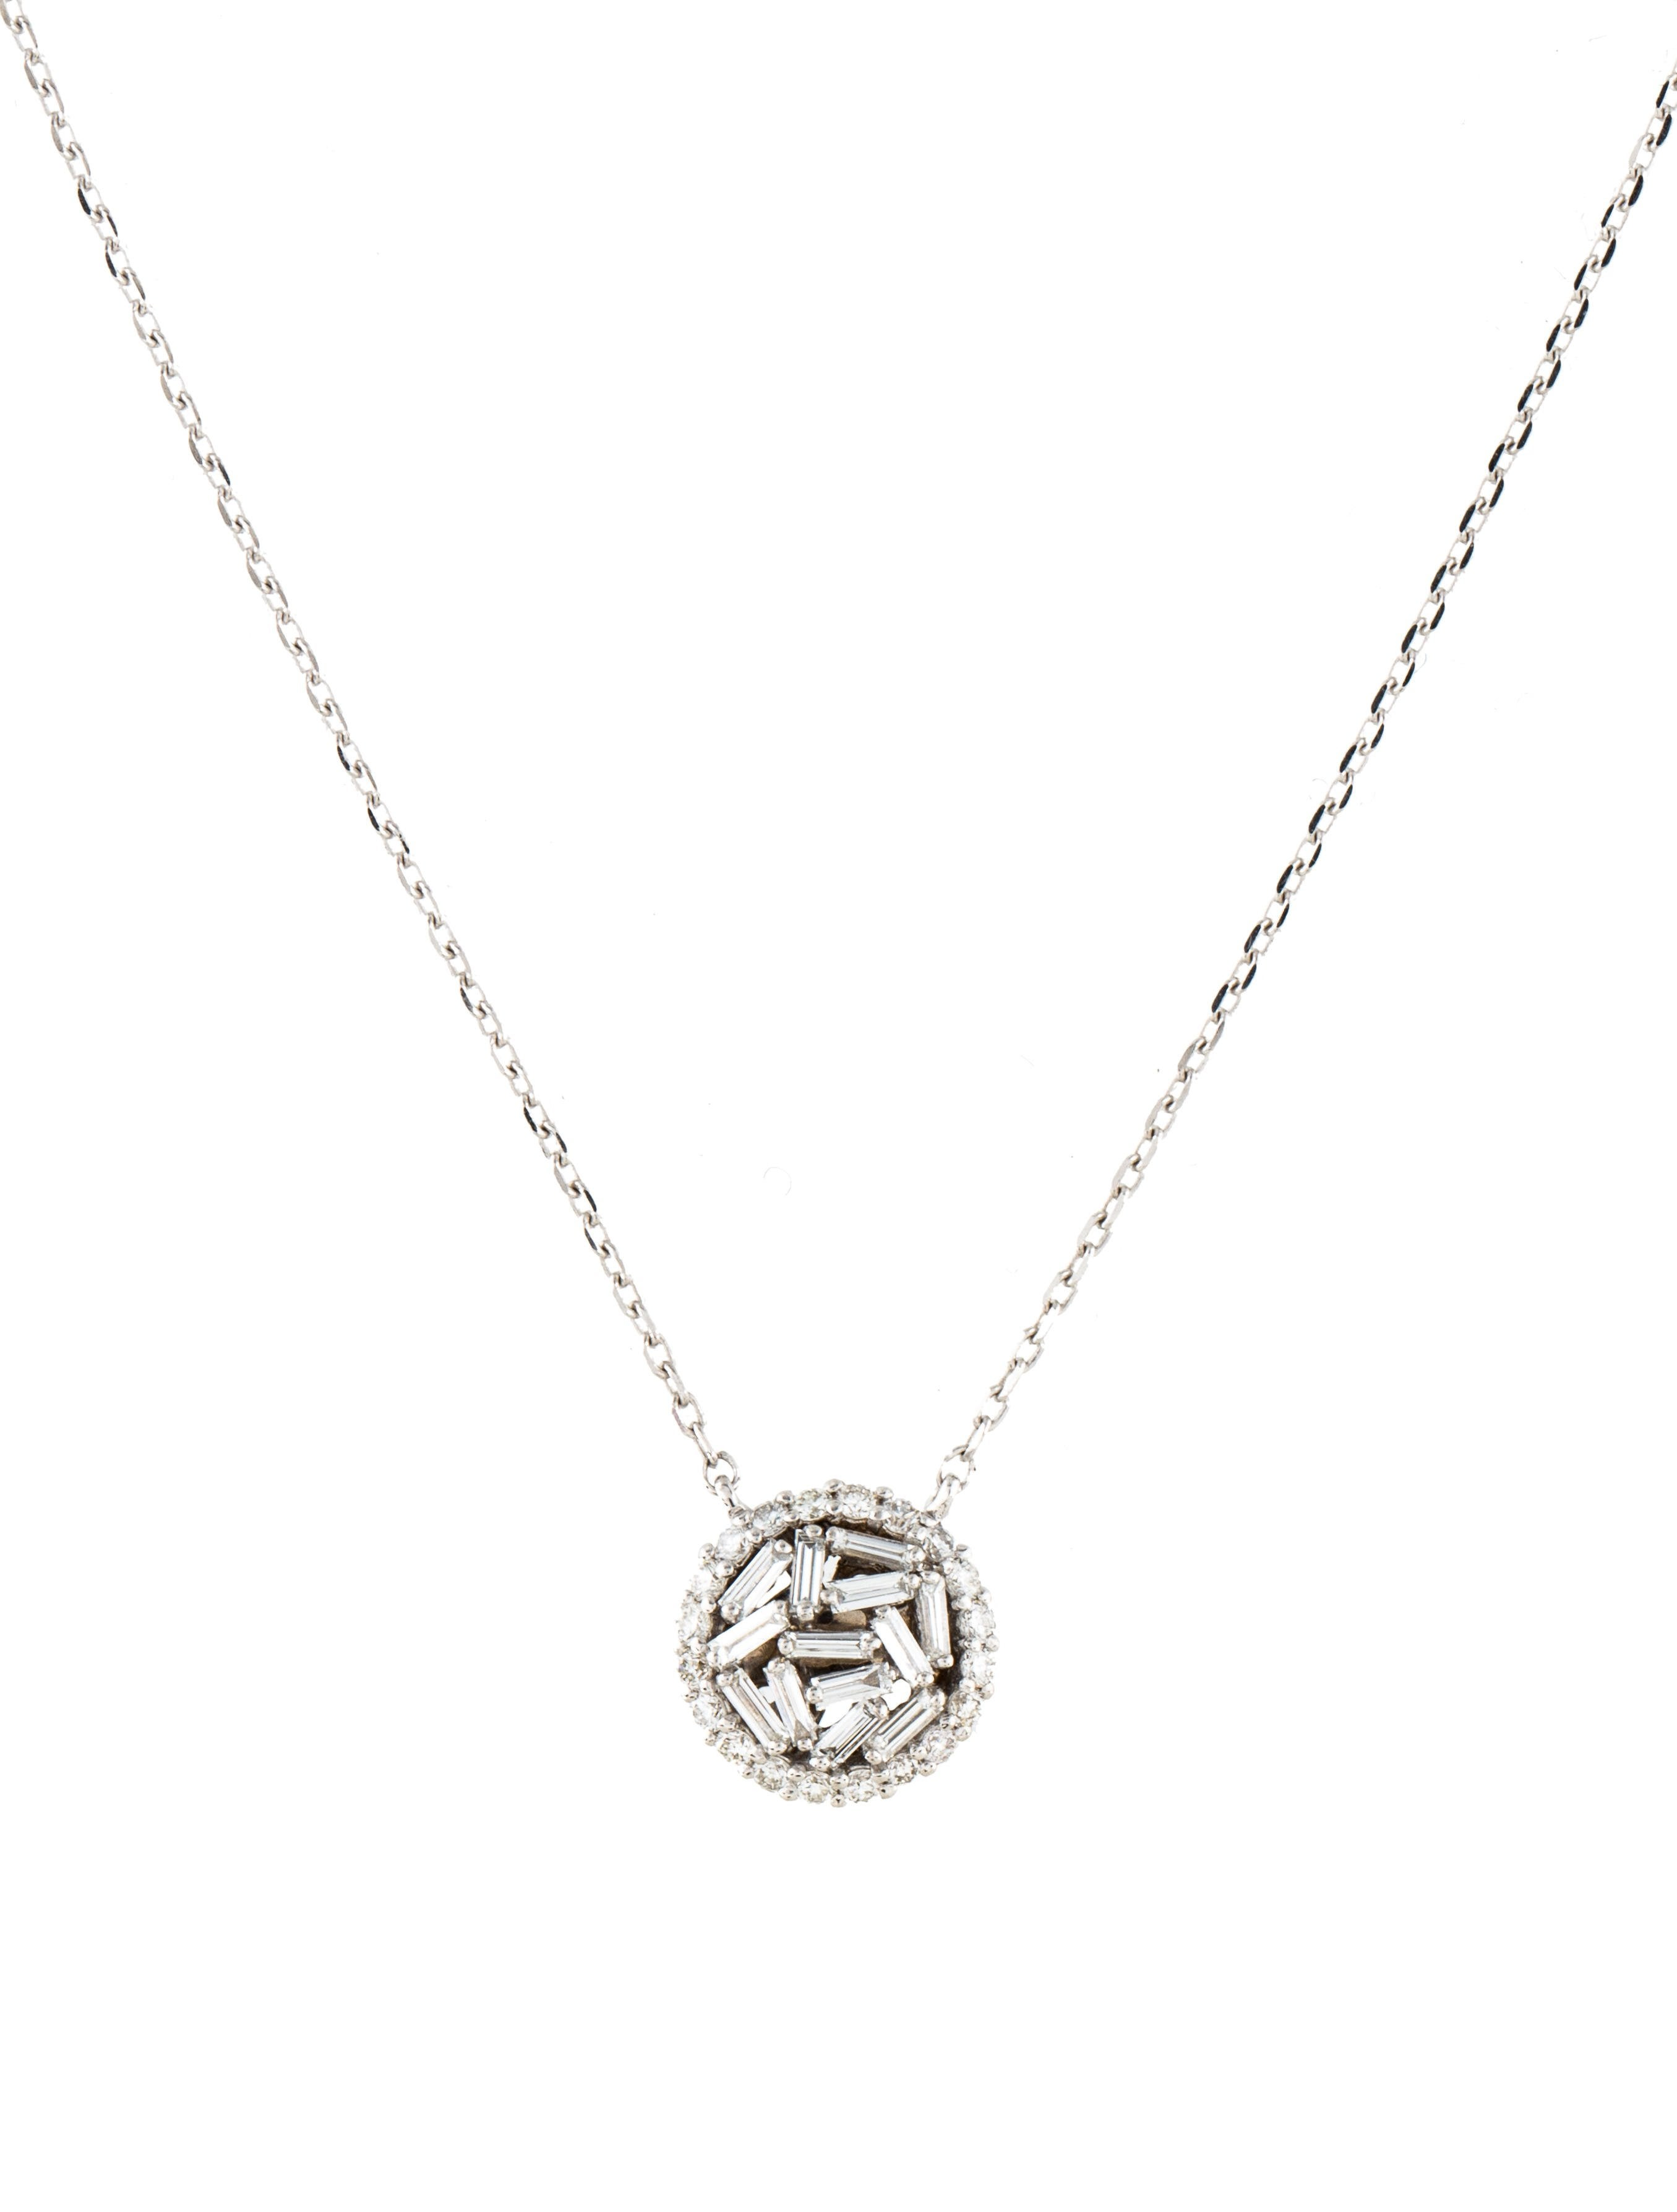 Suzanne kalan 18k diamond circle pendant necklace necklaces 18k diamond circle pendant necklace aloadofball Choice Image